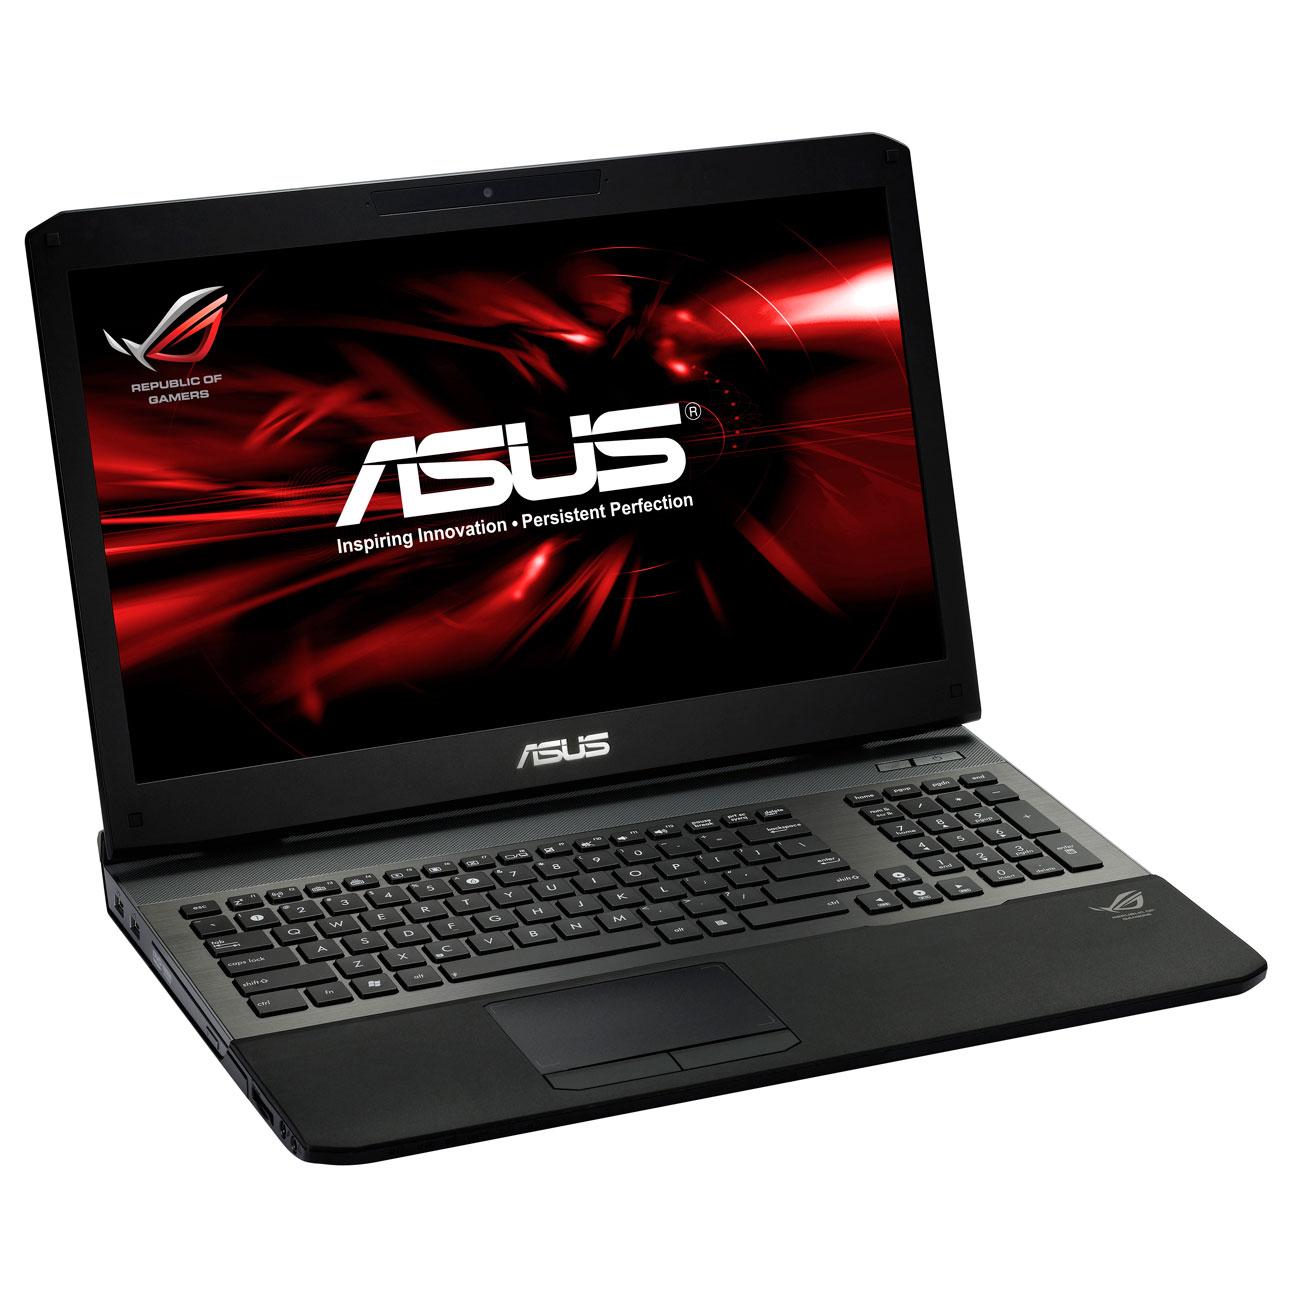 "PC portable ASUS G75VX-T4011H Intel Core i7-3630QM 16 Go SSD 256 Go + HDD 750 Go 17.3"" LED NVIDIA GeForce GTX 670MX Graveur Blu-ray/DVD Wi-Fi N/Bluetooth Webcam Windows 8 64 bits (garantie constructeur 2 ans)"